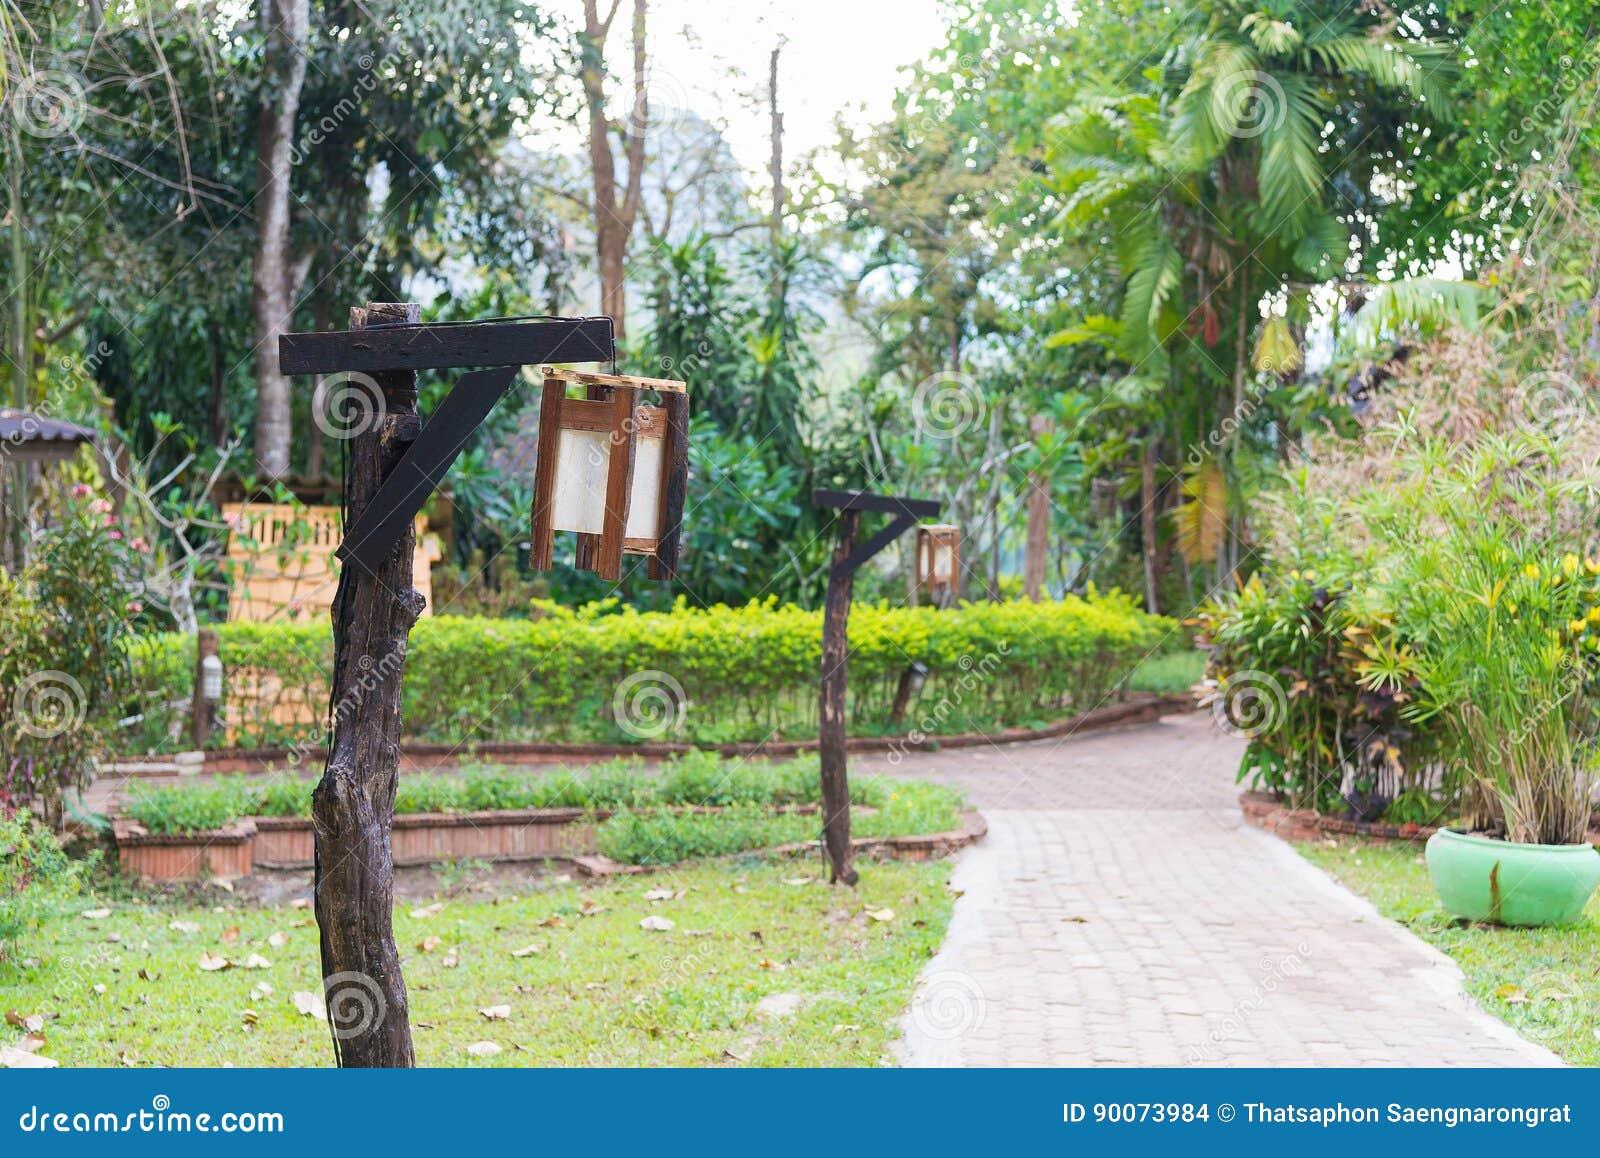 Gras In Tuin : ≥ snel u gazon gras vernieuwen tuin frezen spitten ploegen gras